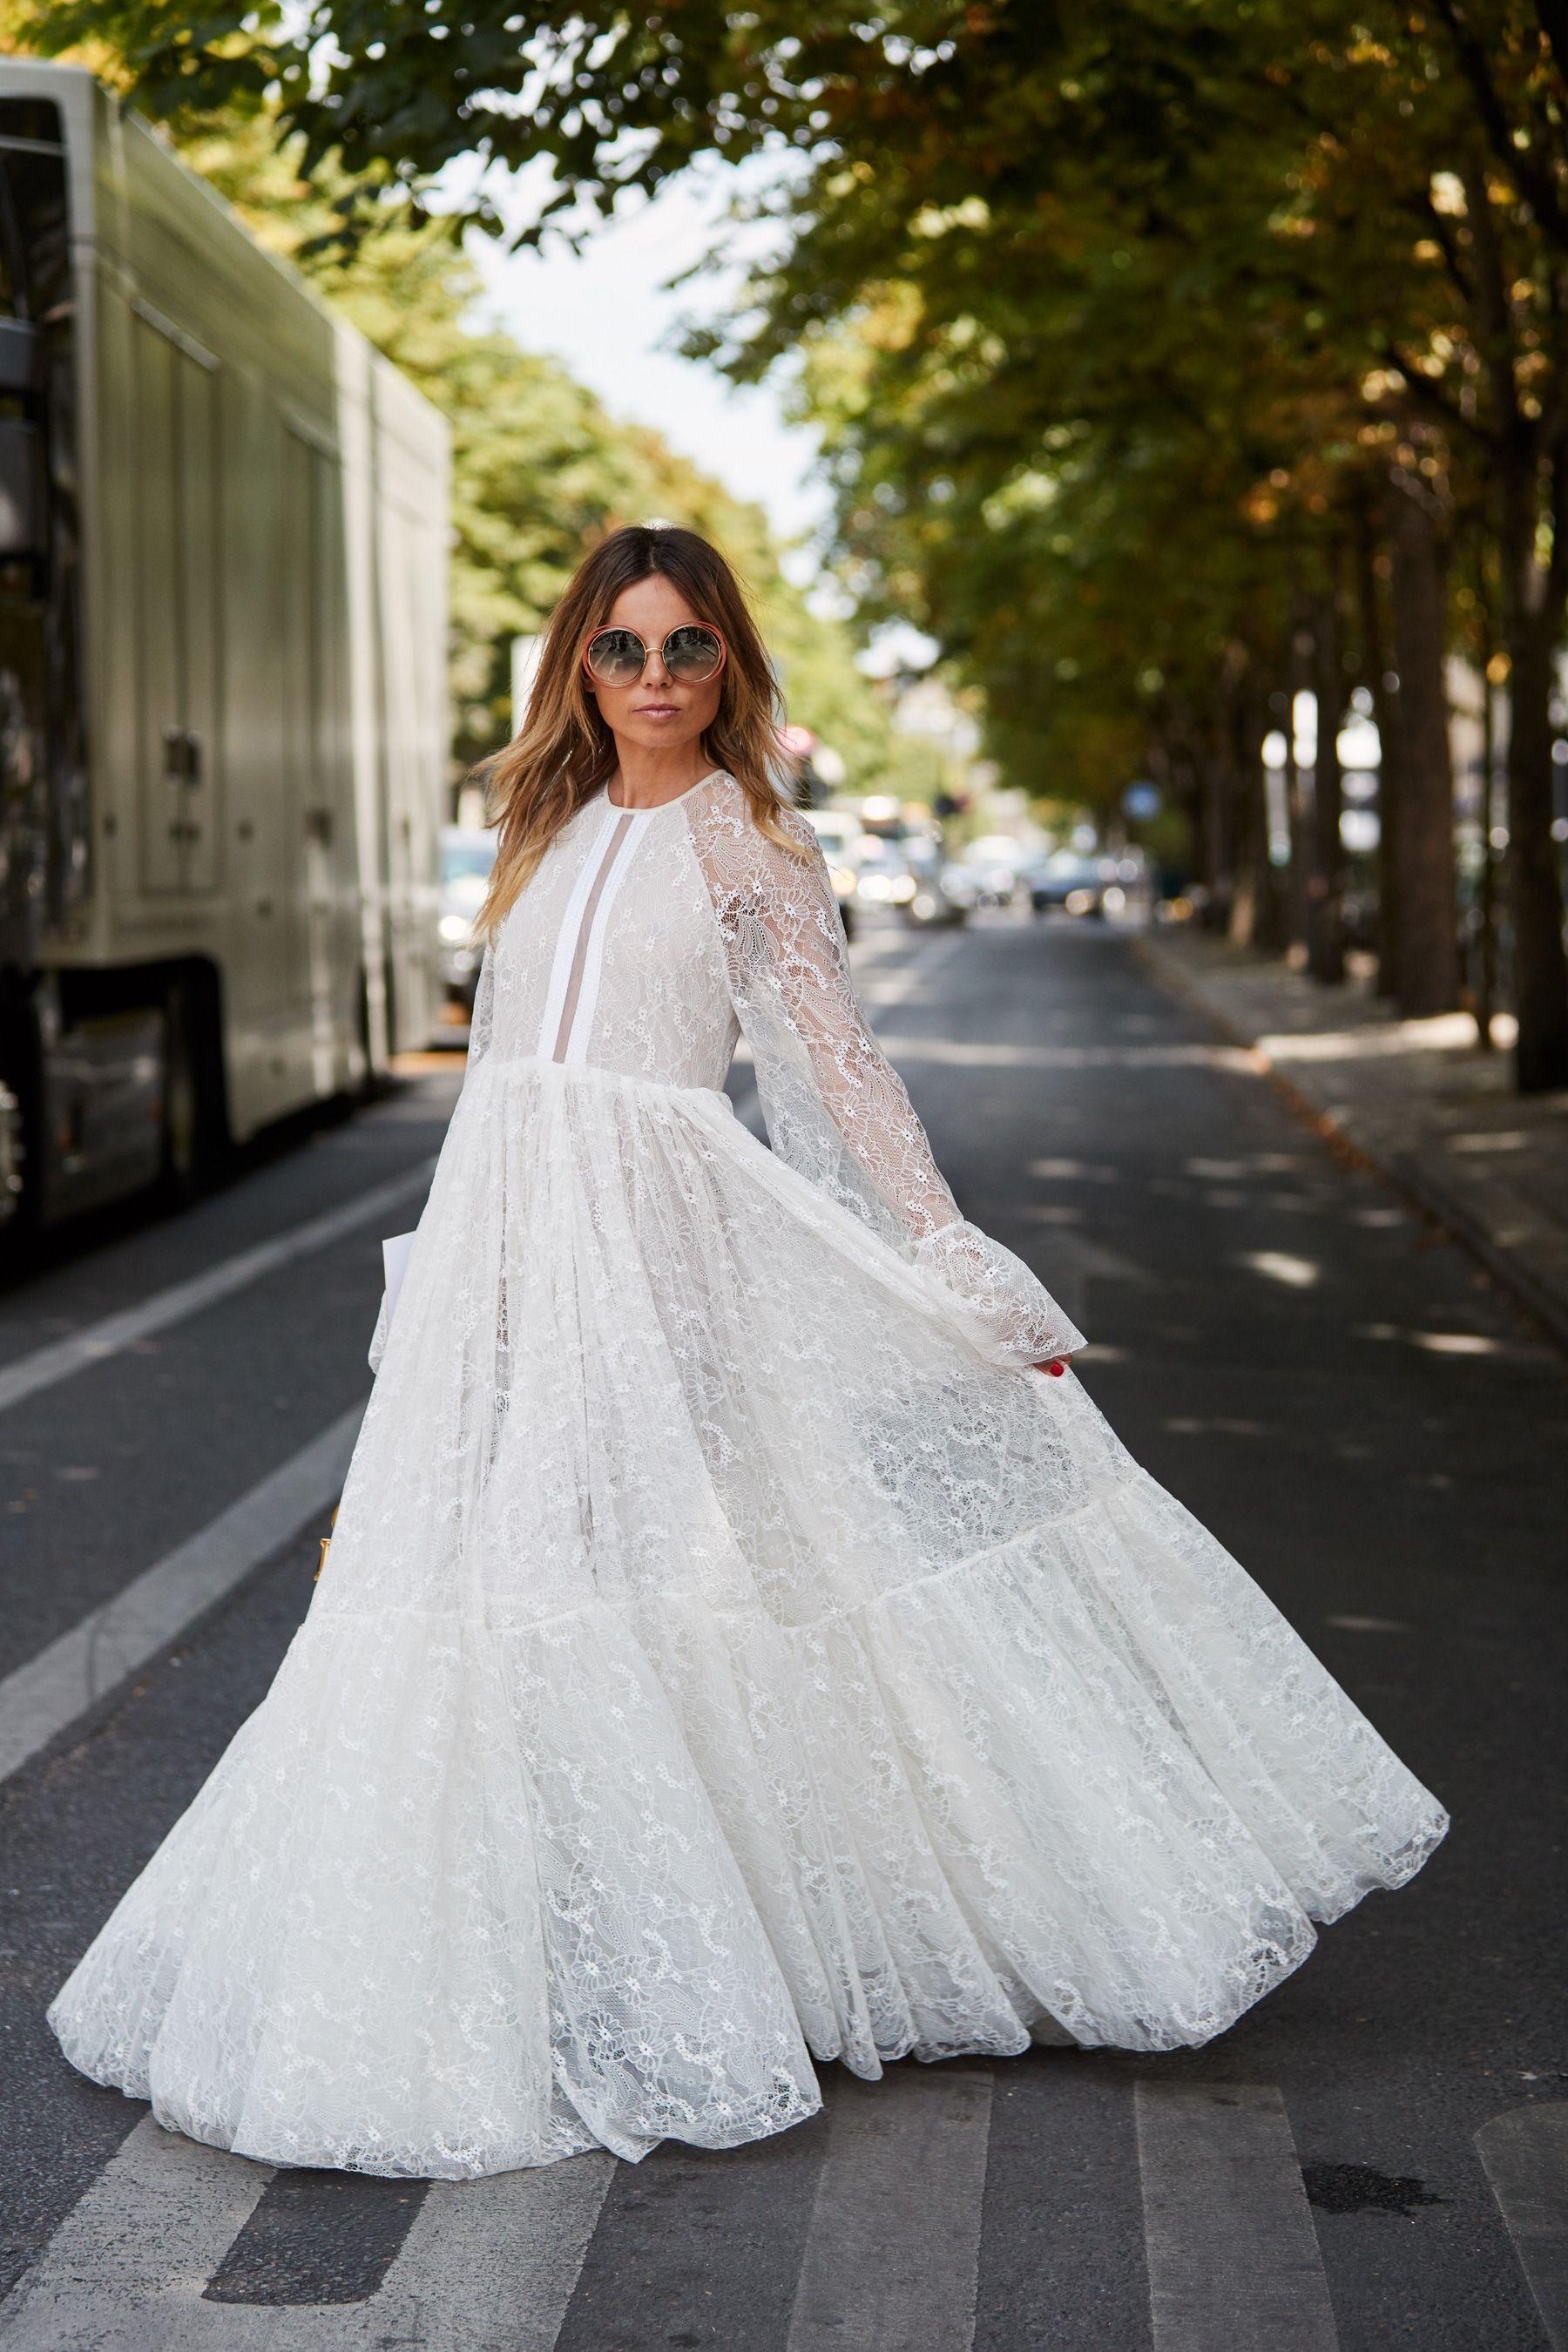 Pin By Haute Design London On Haute Couture Fall 2019 Autumn Street Style Paris Fashion Week Fashion